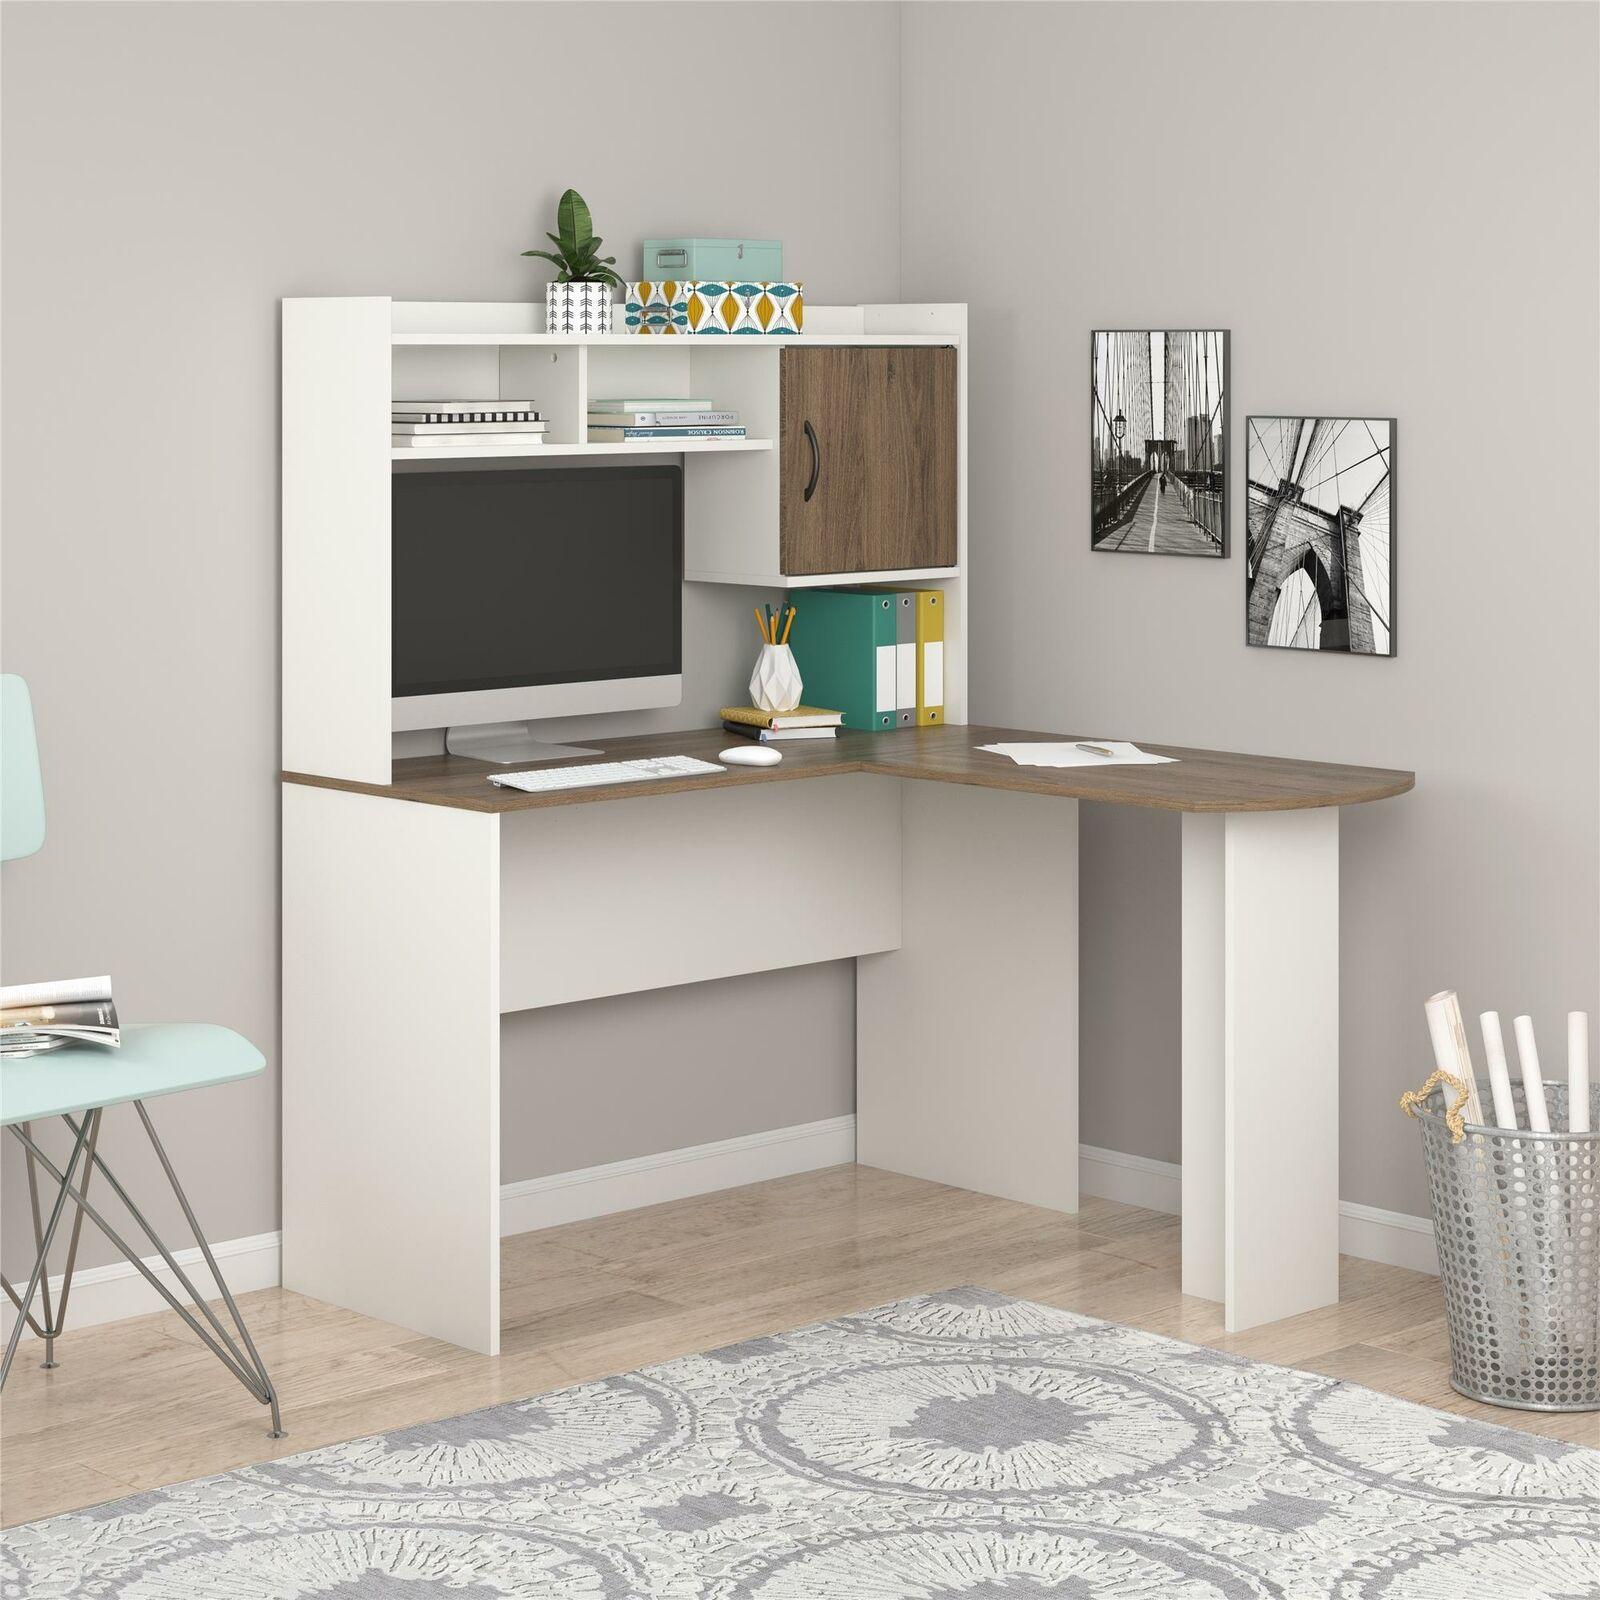 Picture of: Home Office Desks Aleko Cd03bk Contemporary Swivel Corner L Shaped Dark Brown For Sale Online Ebay